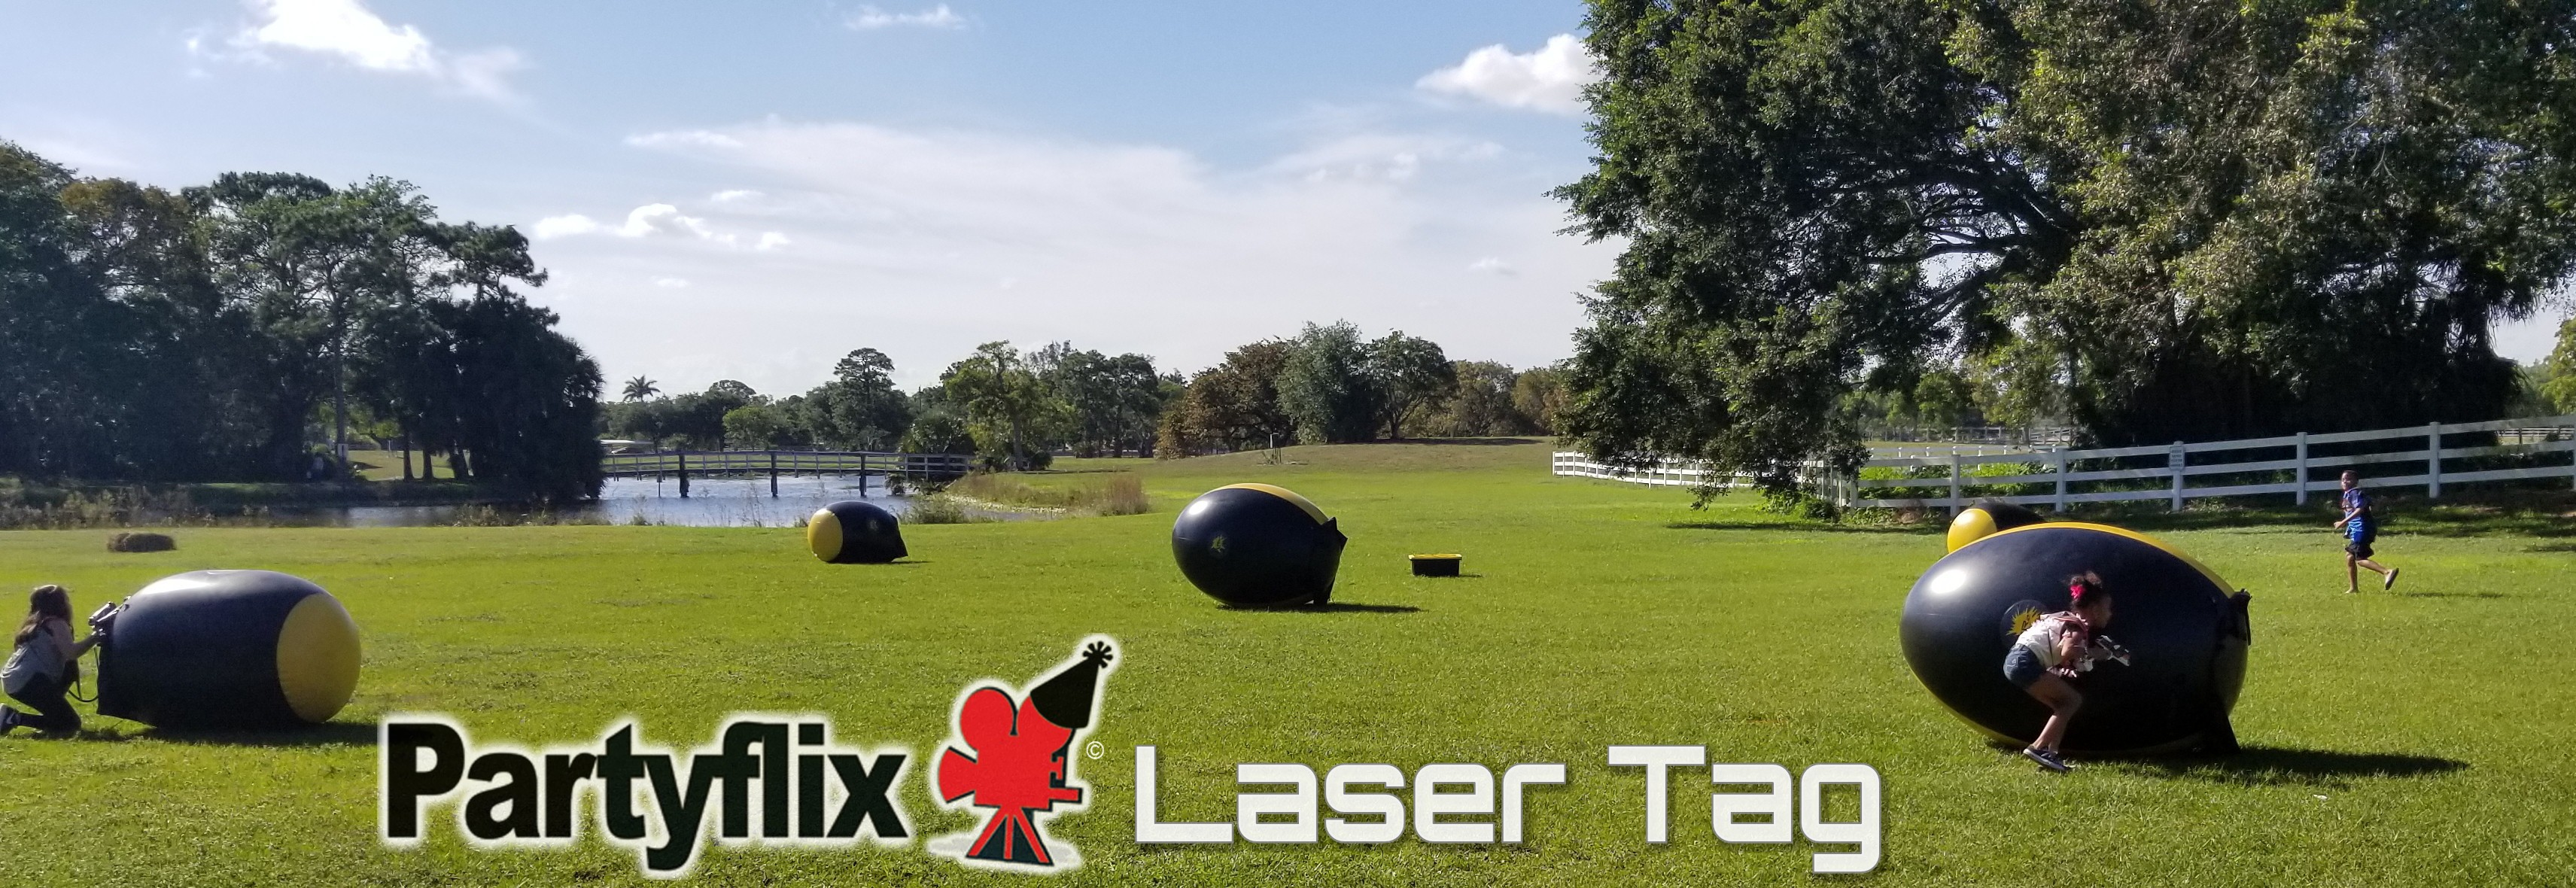 Partyflix Laser Tag